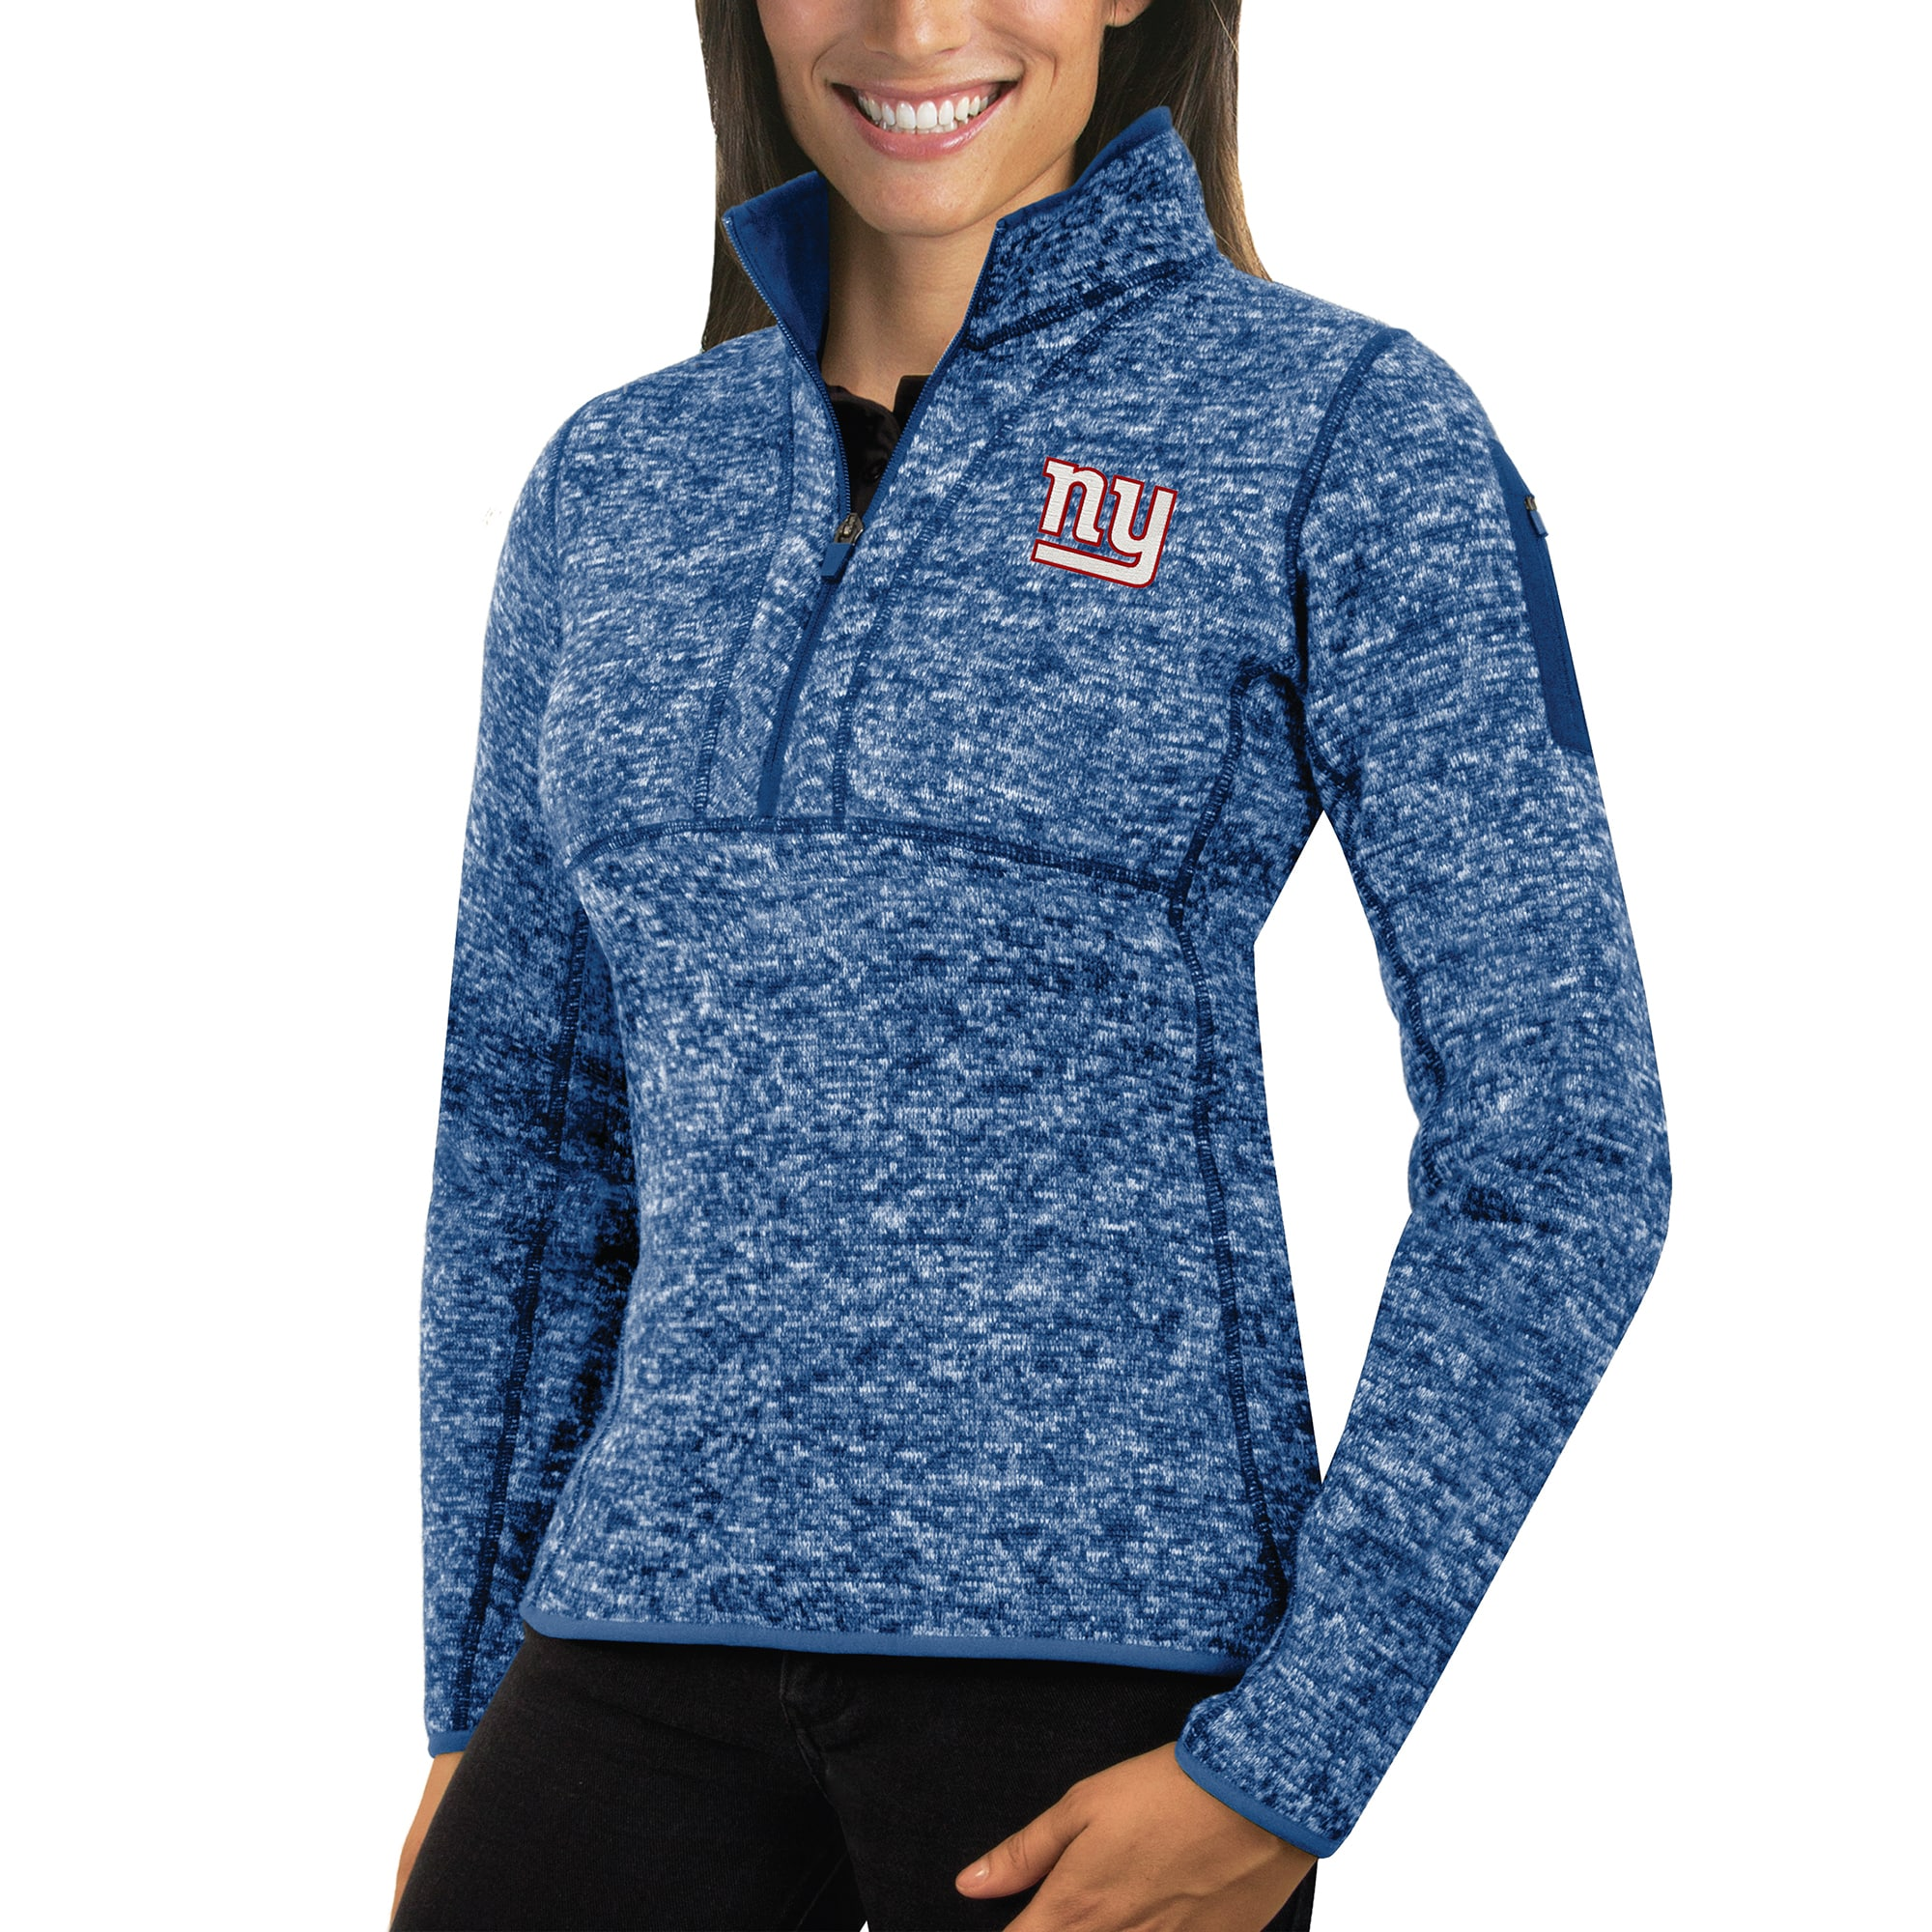 New York Giants Antigua Women's Fortune Half-Zip Sweater - Heather Royal